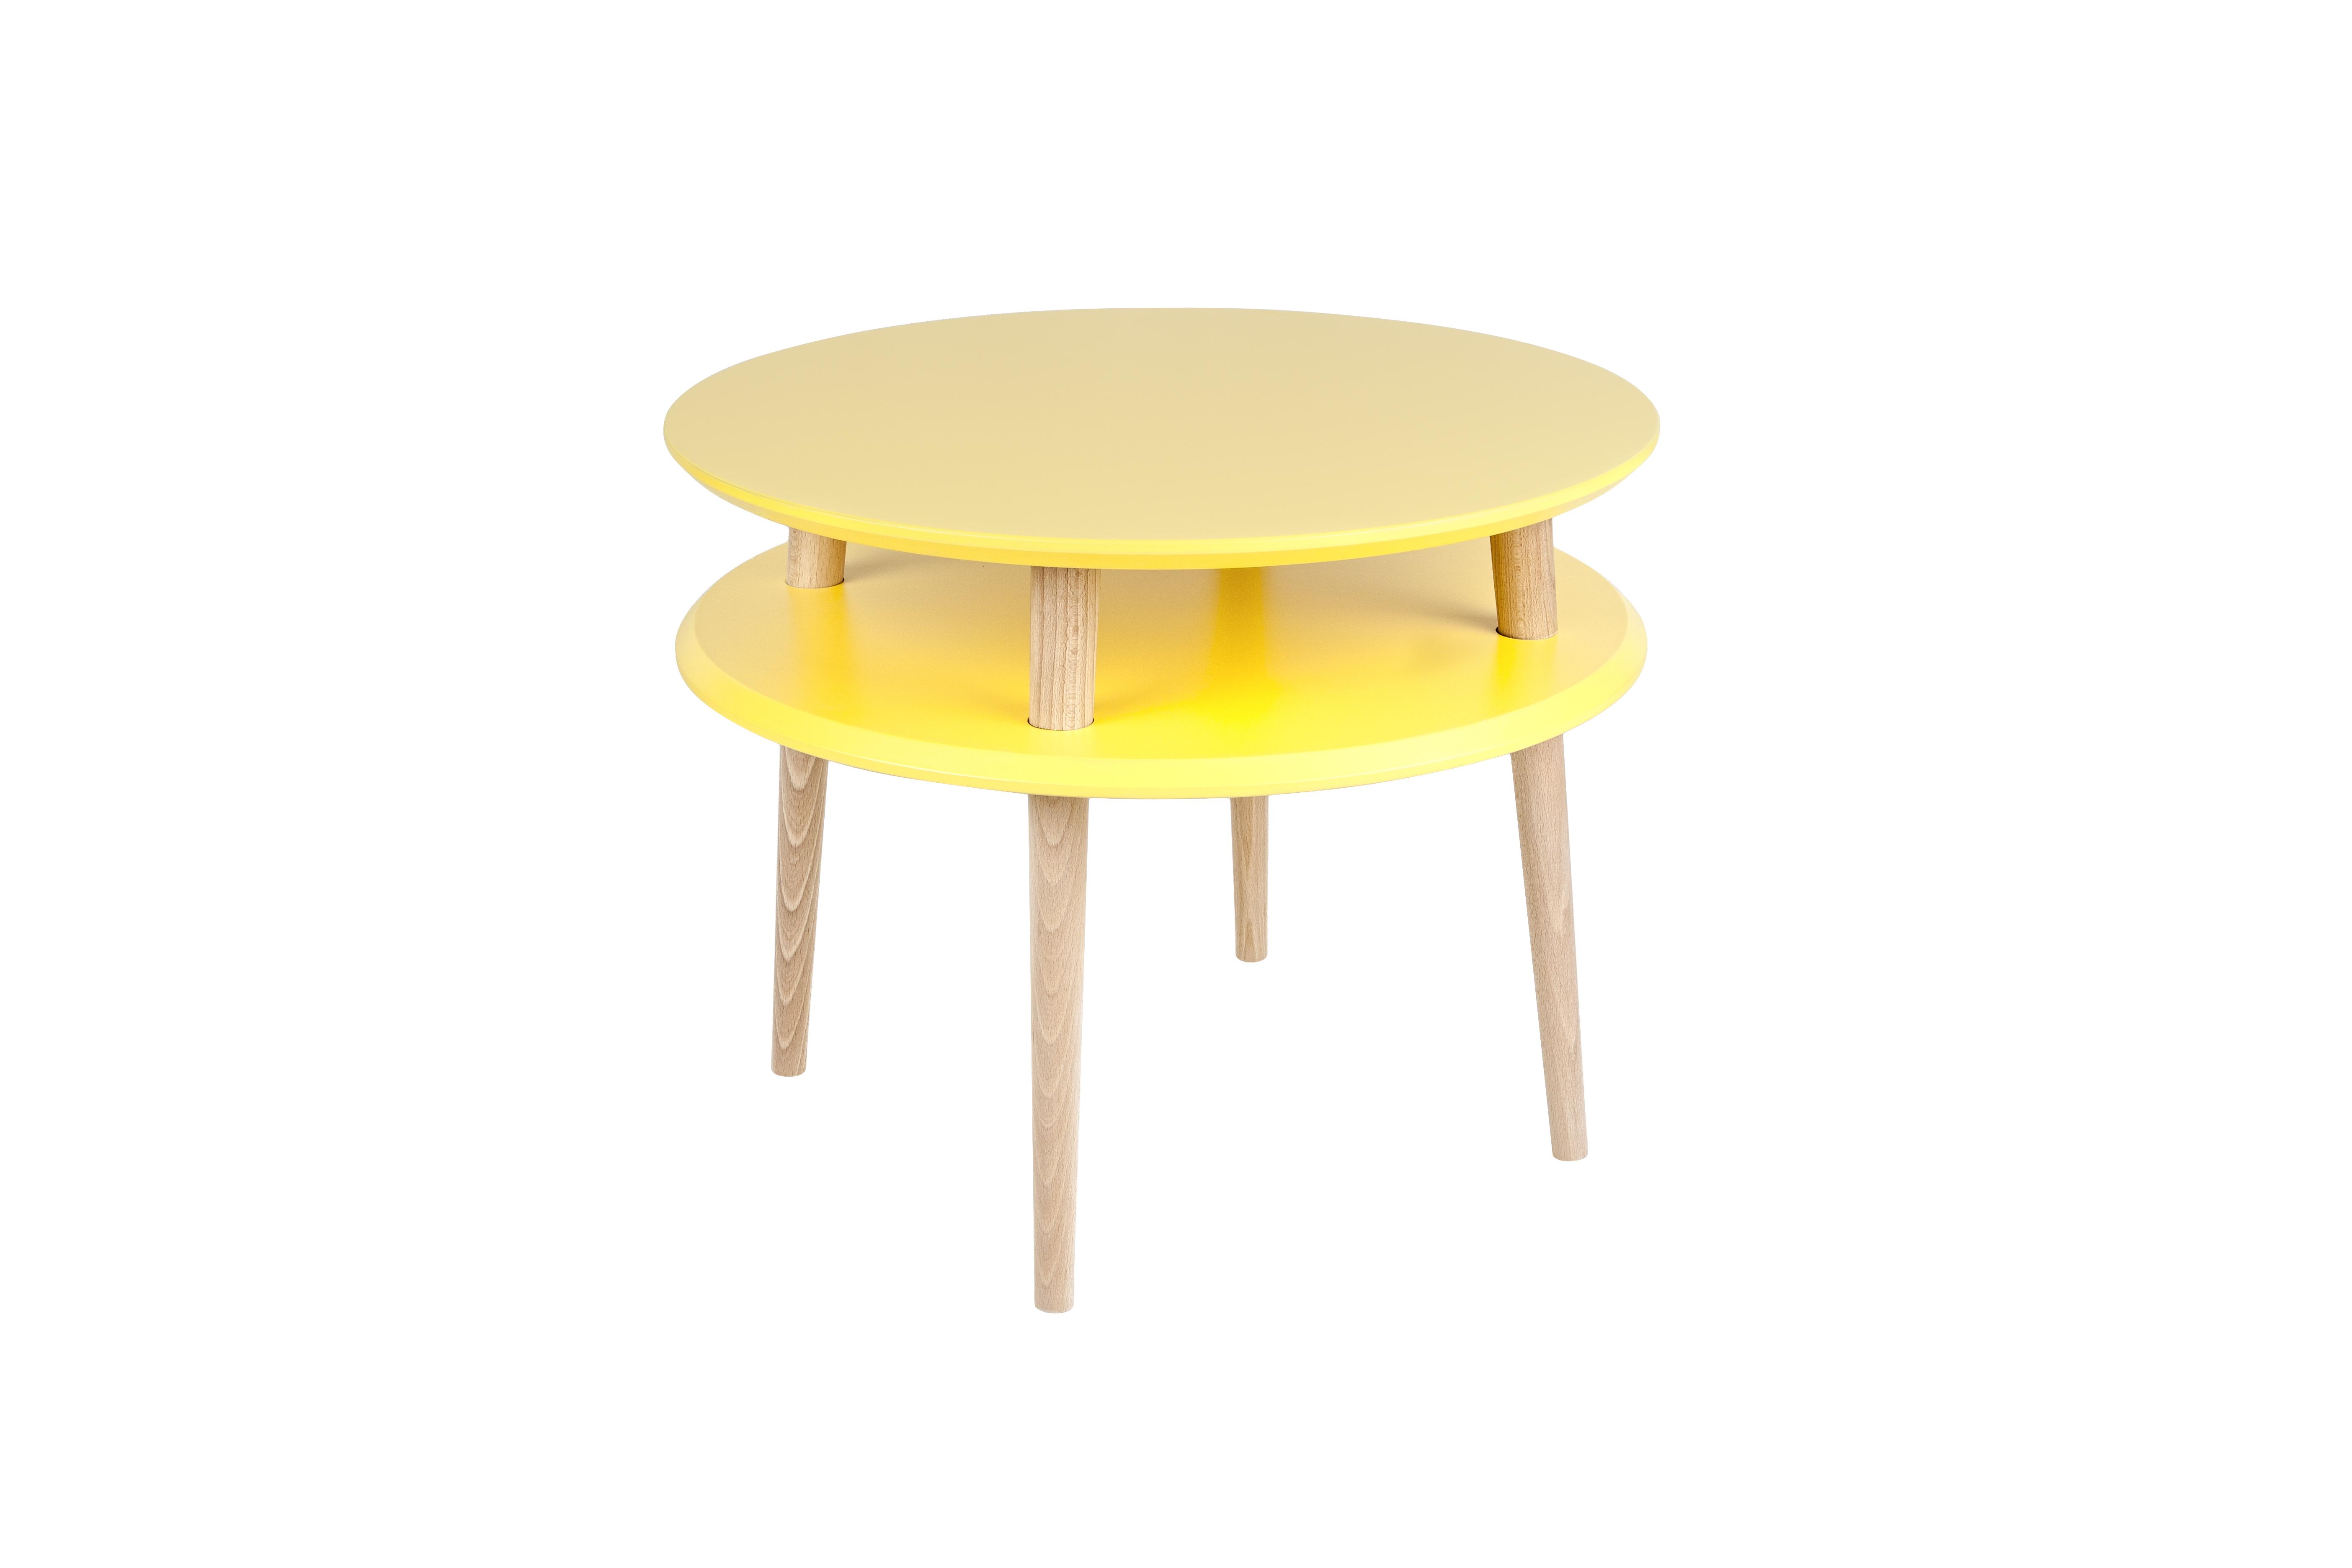 Masa de cafea Ufo Medium Yellow, Ø57xh45 cm